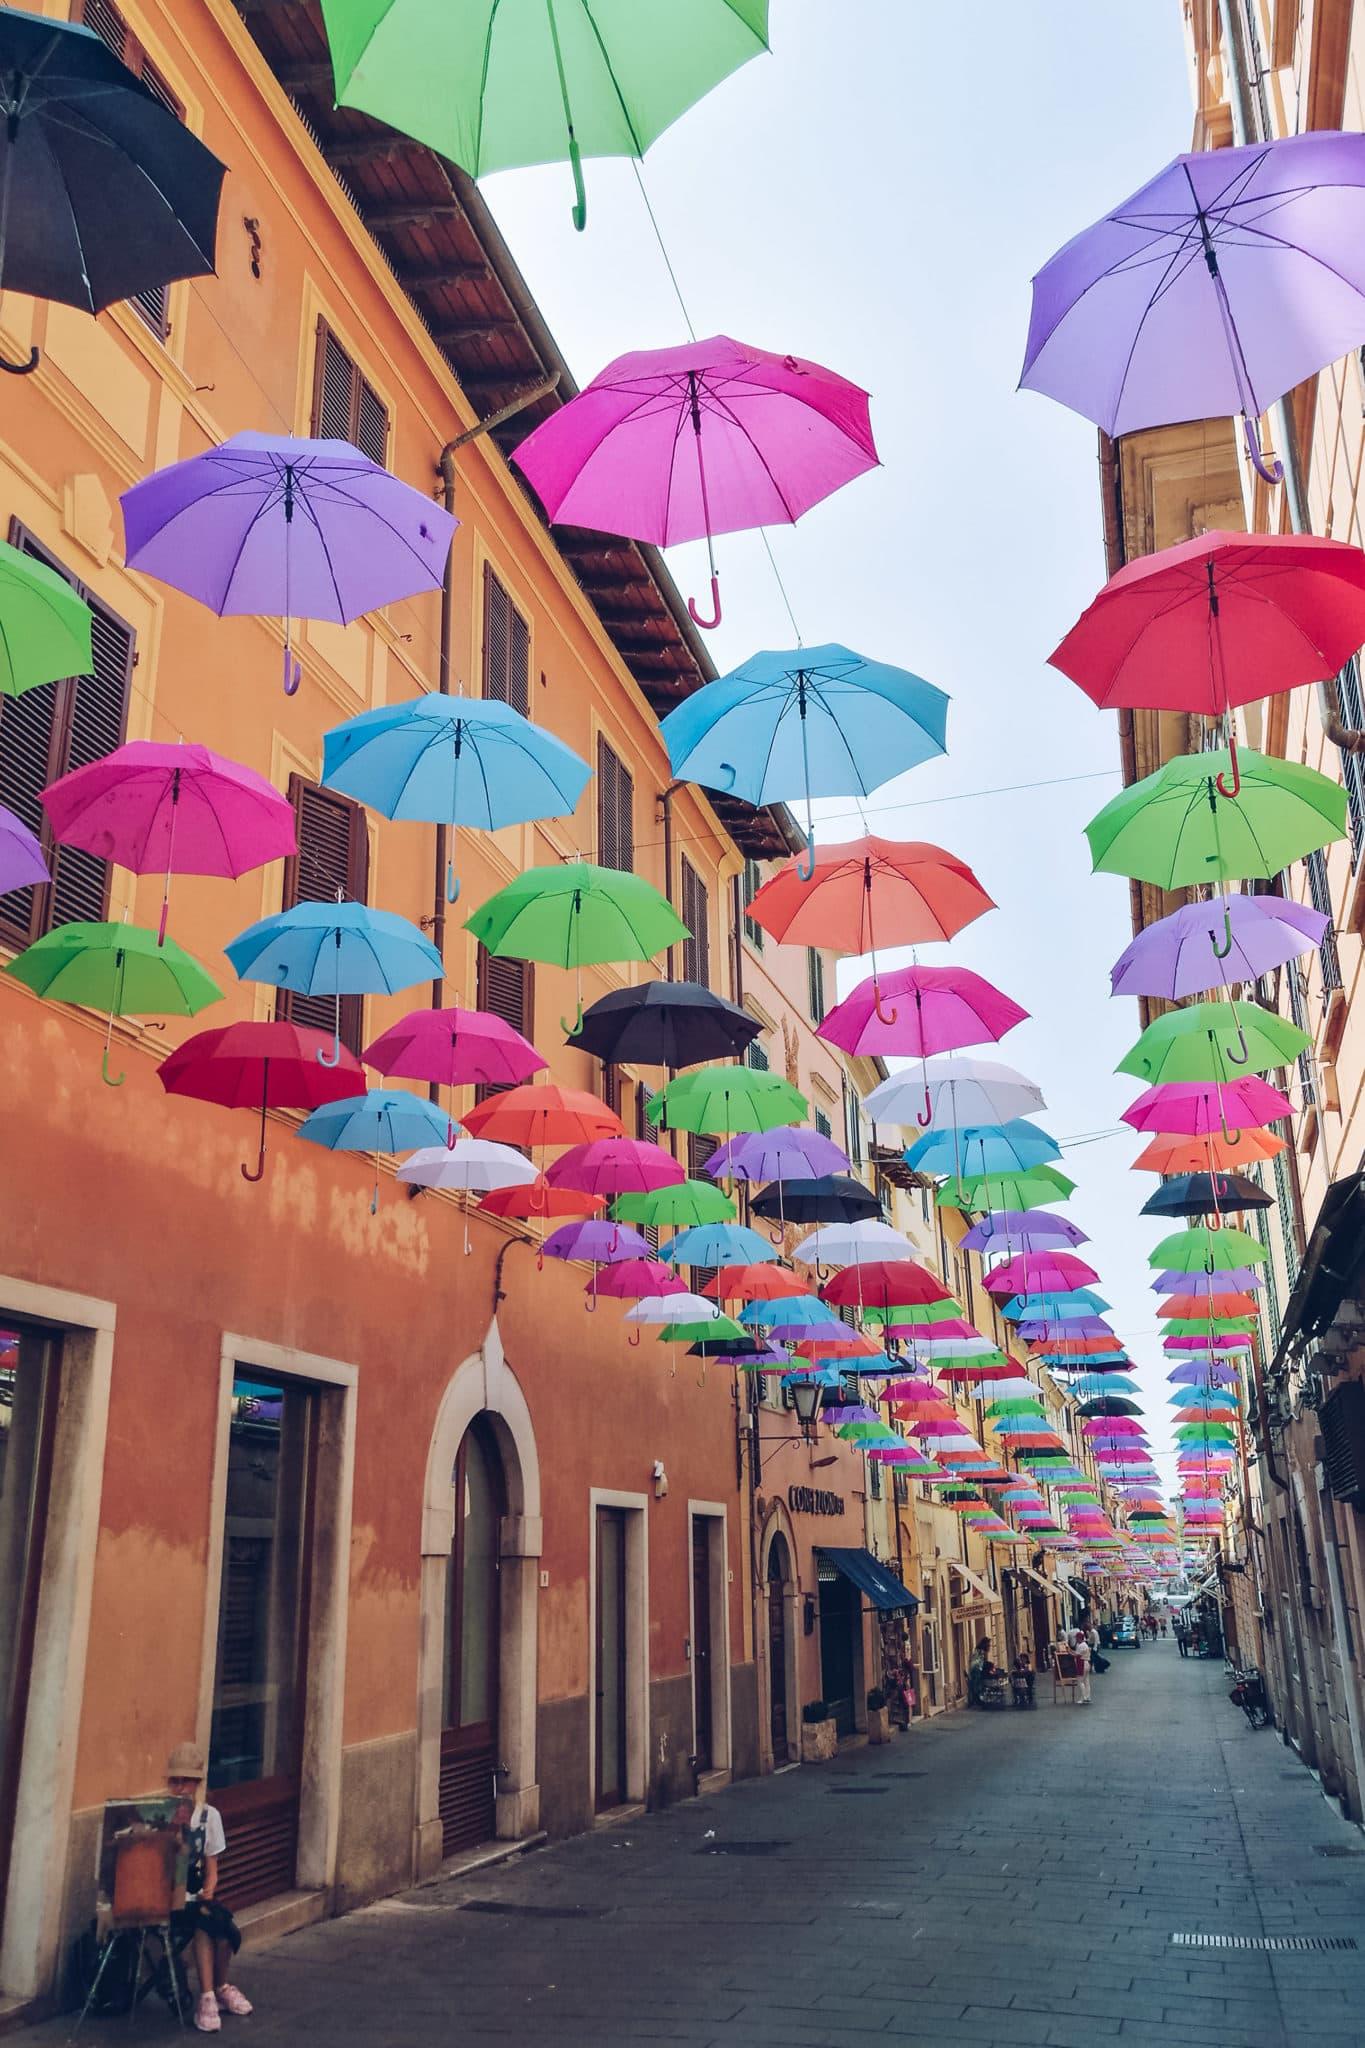 Floating Umbrella in Pietrasanta in Via Mazzini